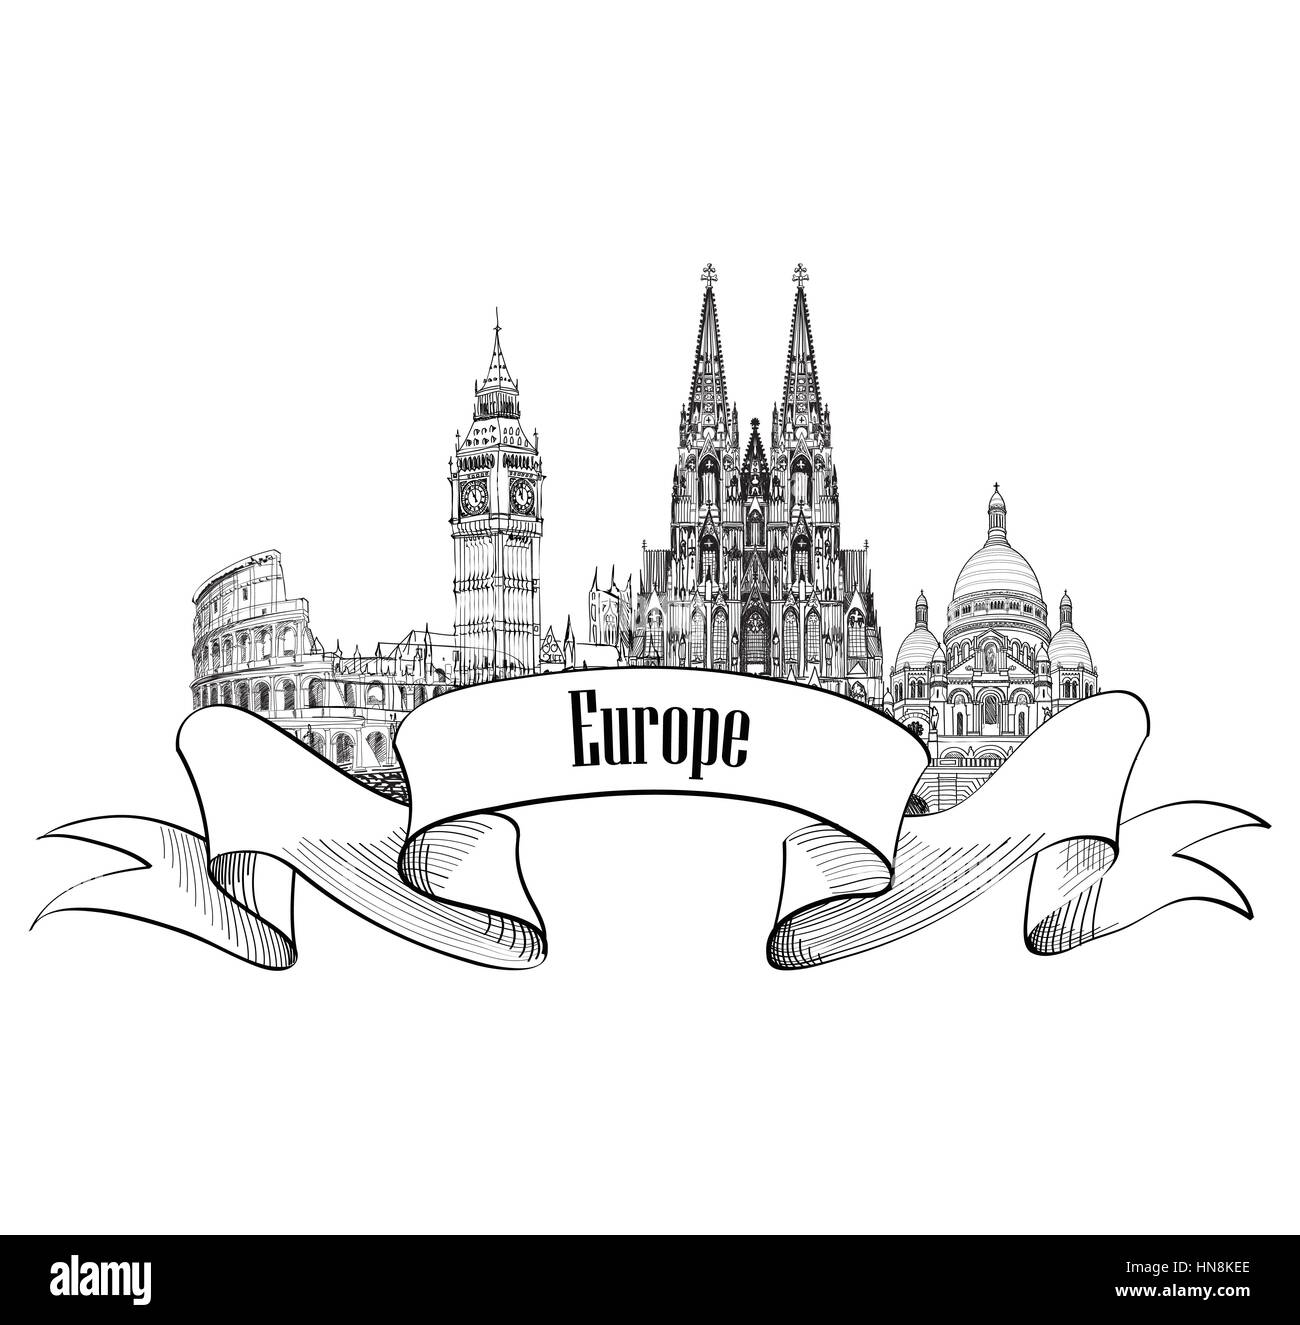 Travel Europe label. Famous buildings and landmarks. European capital city emblem. - Stock Vector